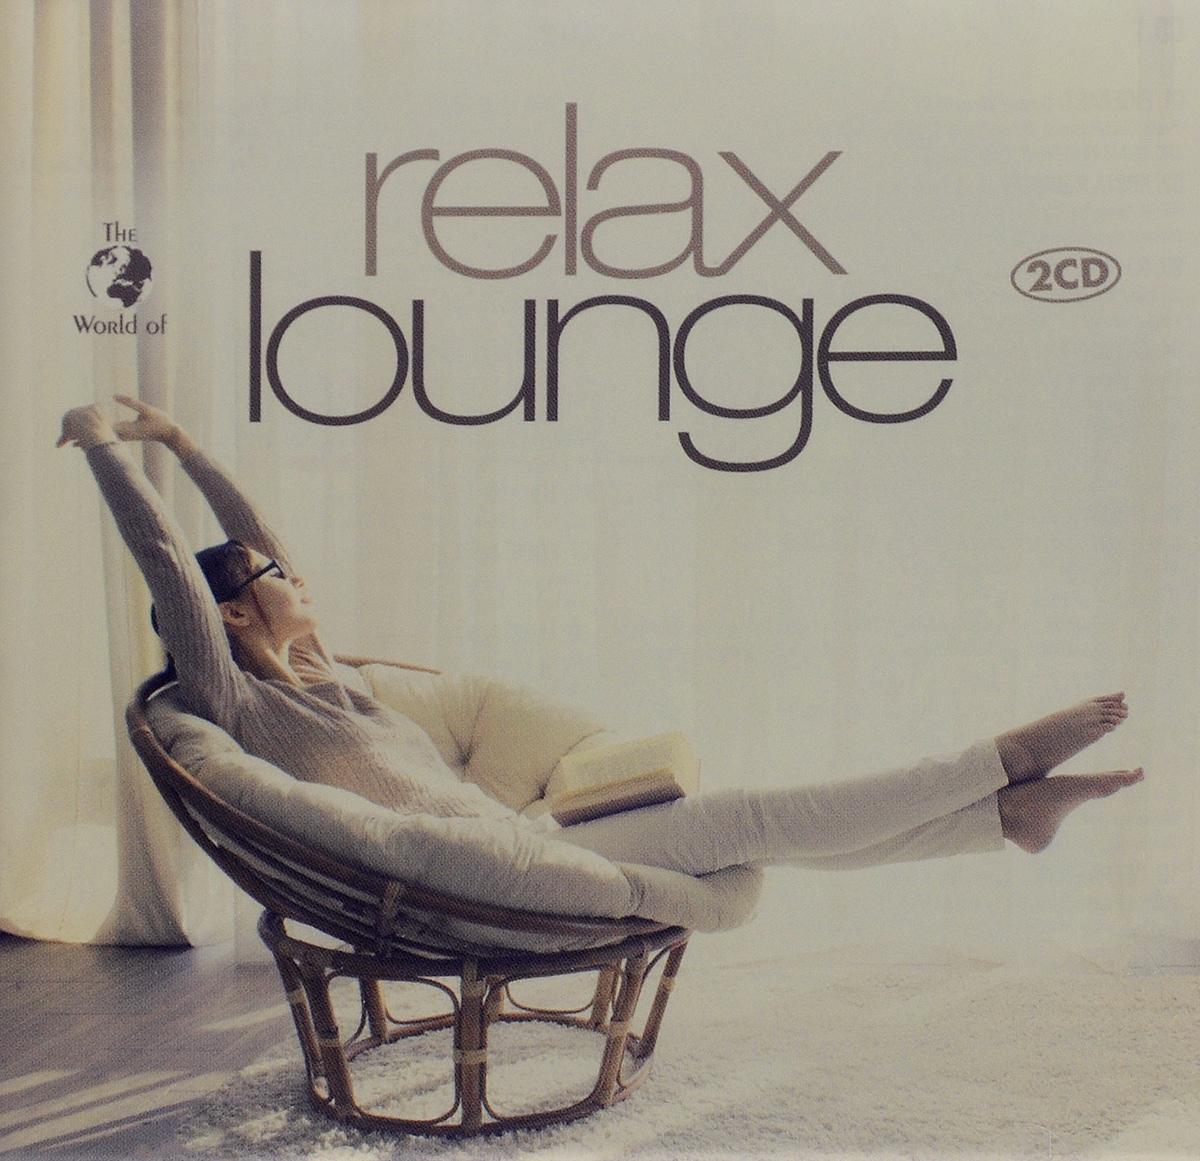 Eigenart,Коста Родригез,DJ Shah,Skysurfer,Manoa,Biboul Darouiche Soleil Bantu,Mezzoforte,Tok Tok Tok,Anastacia The World Of Relax Lounge (2 CD) цена